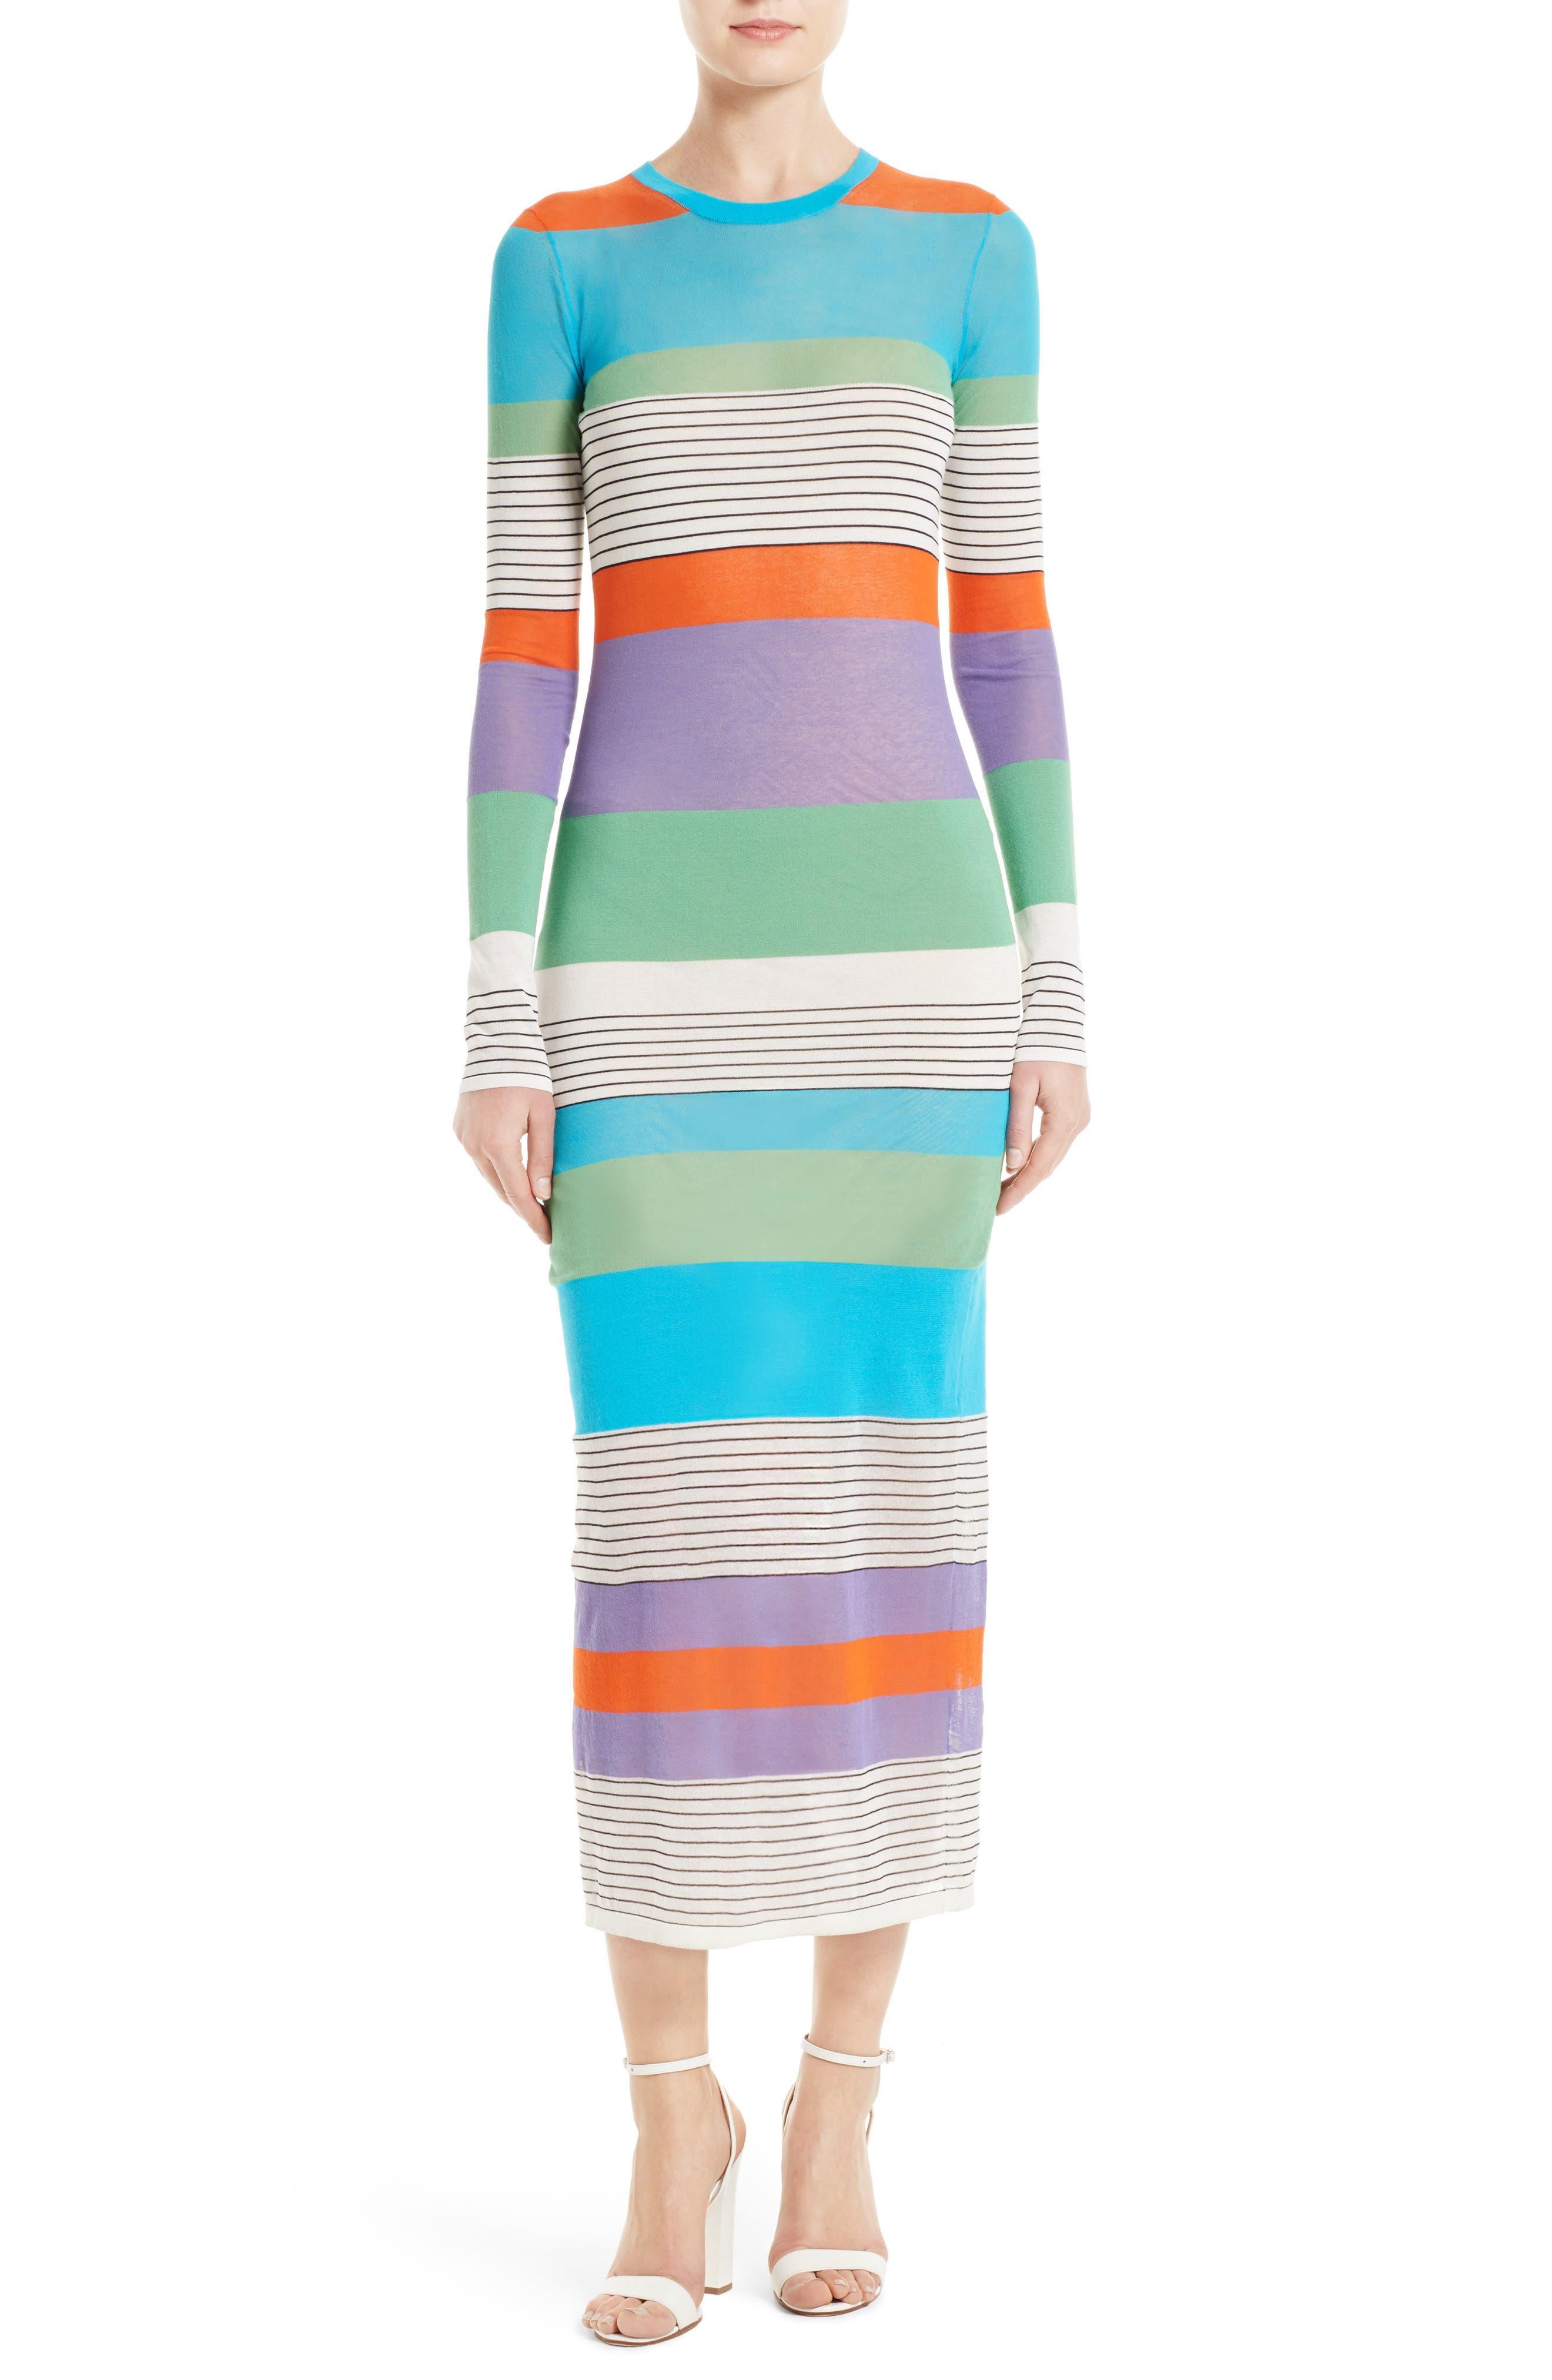 Main Image - Diane von Furstenberg Colorblock Knit Midi Dress